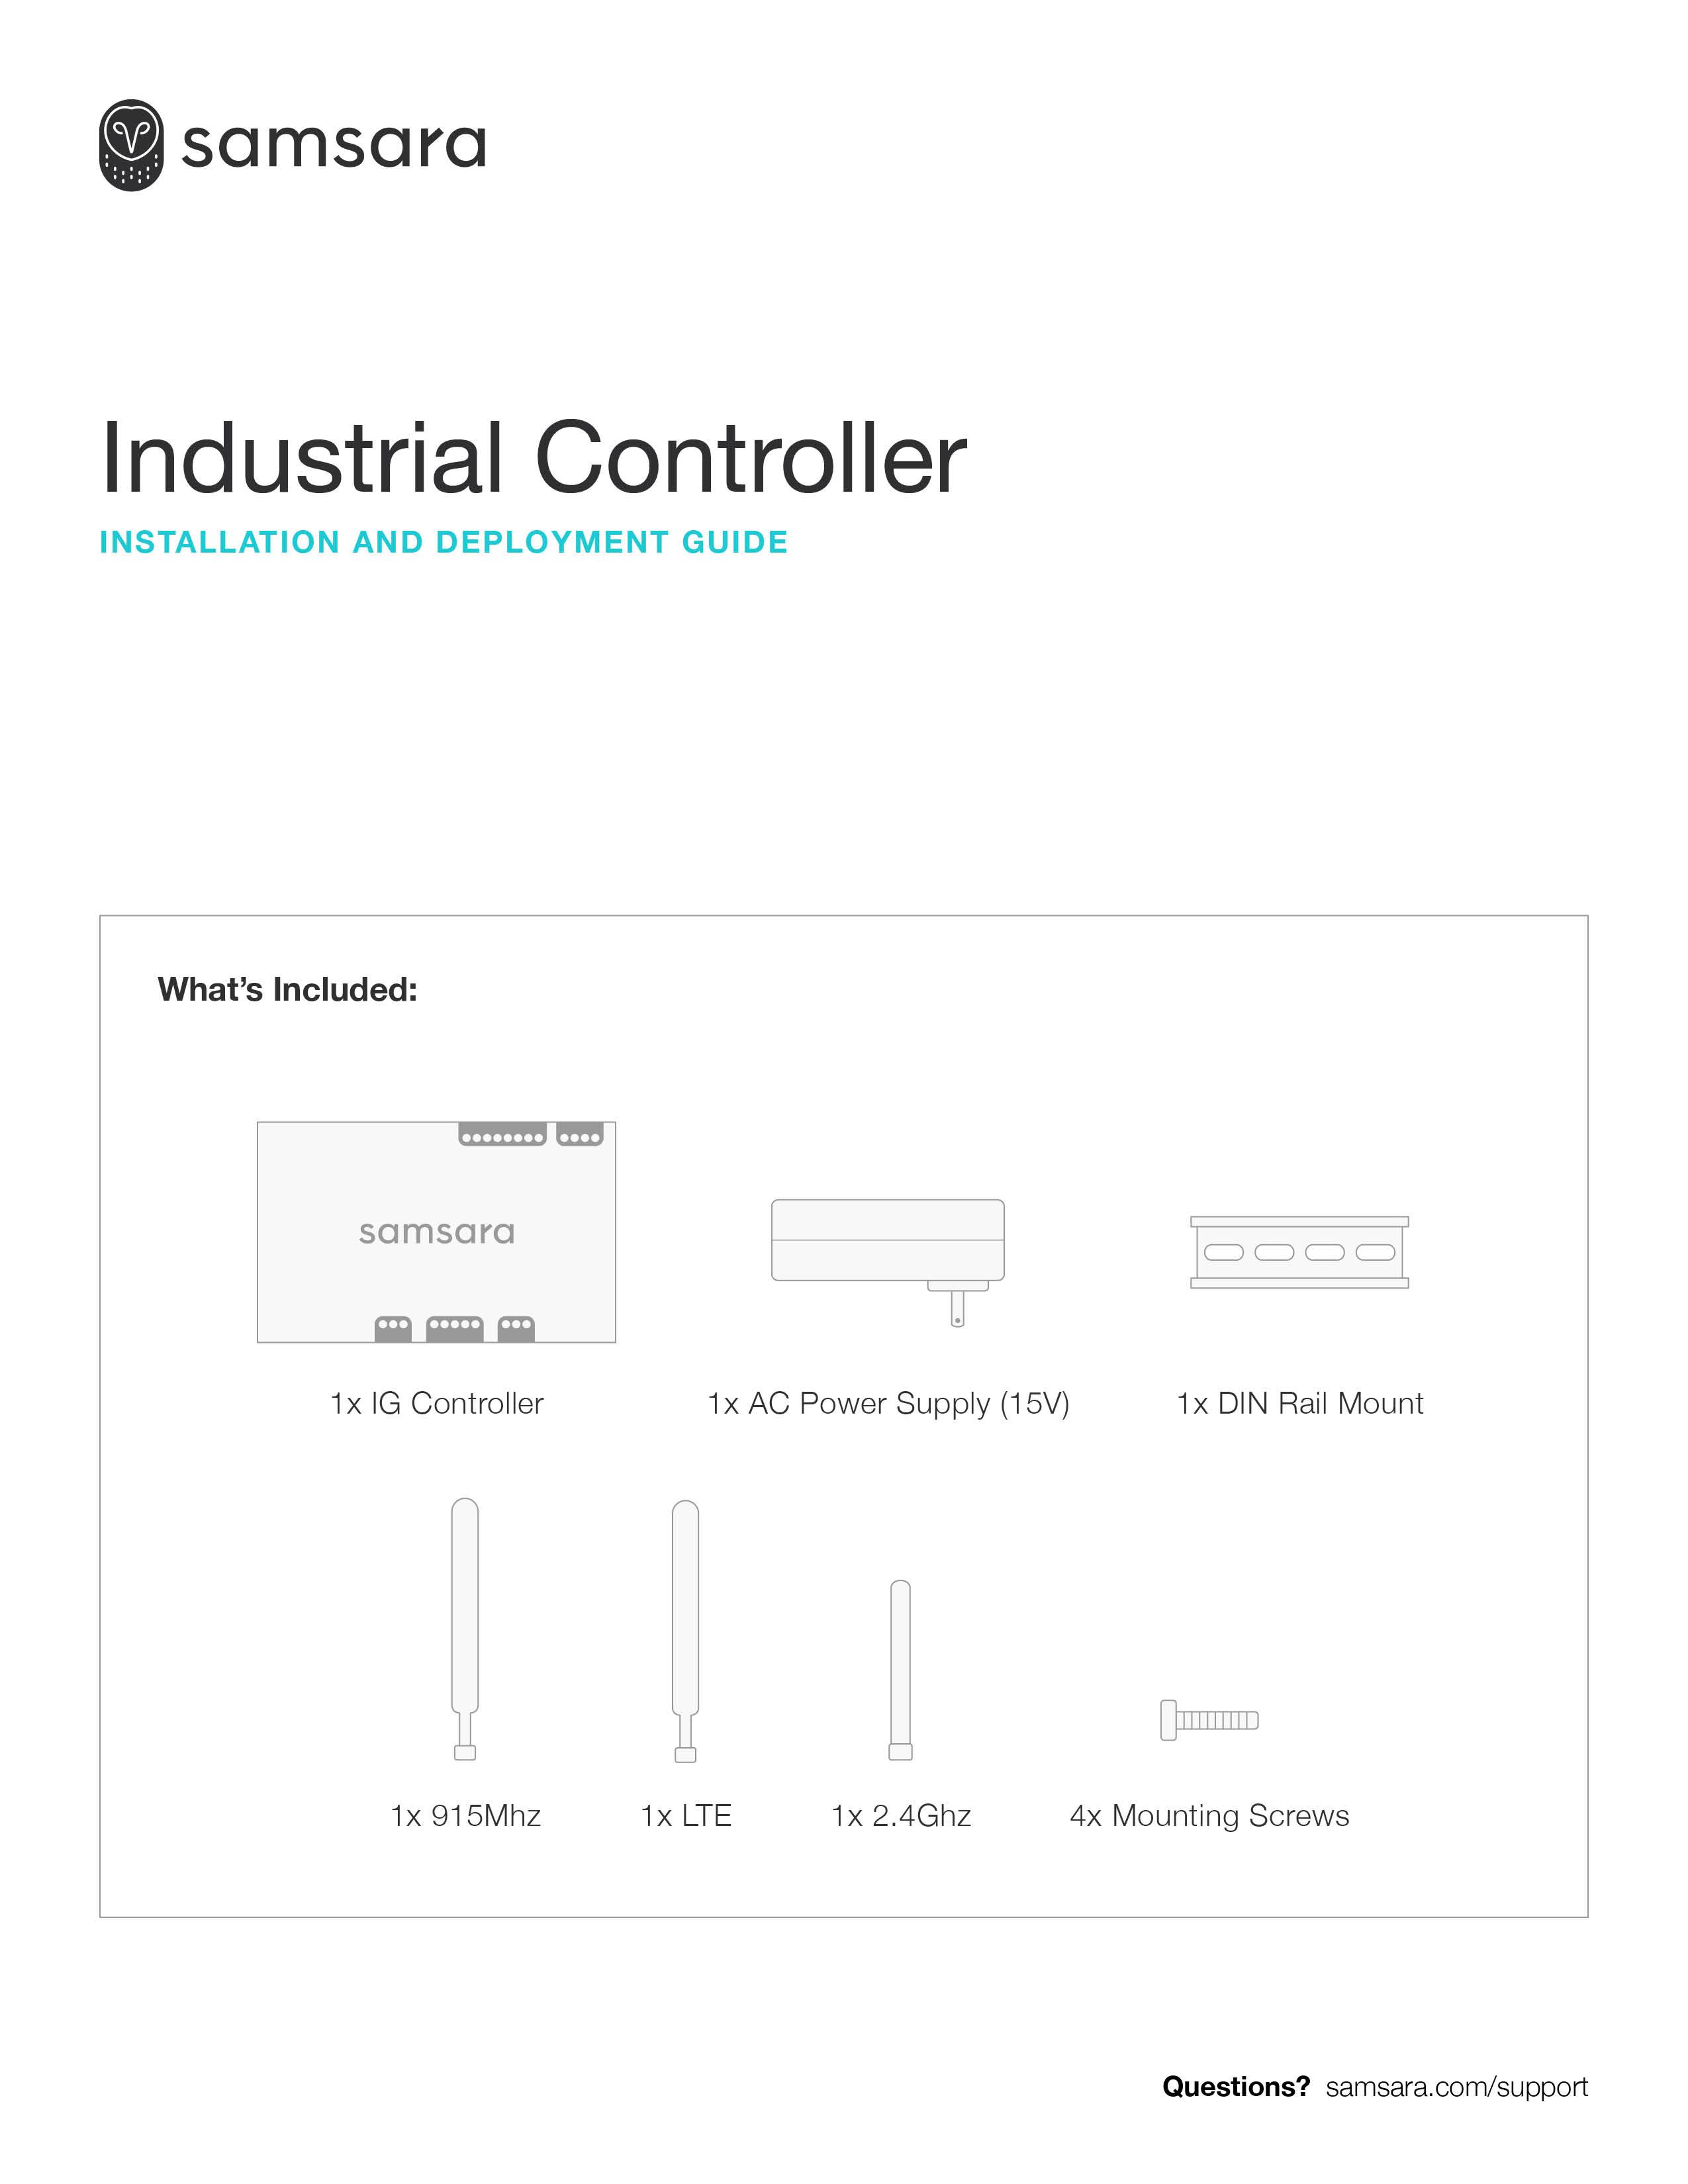 Gps Tracker Installation Manual Pdf